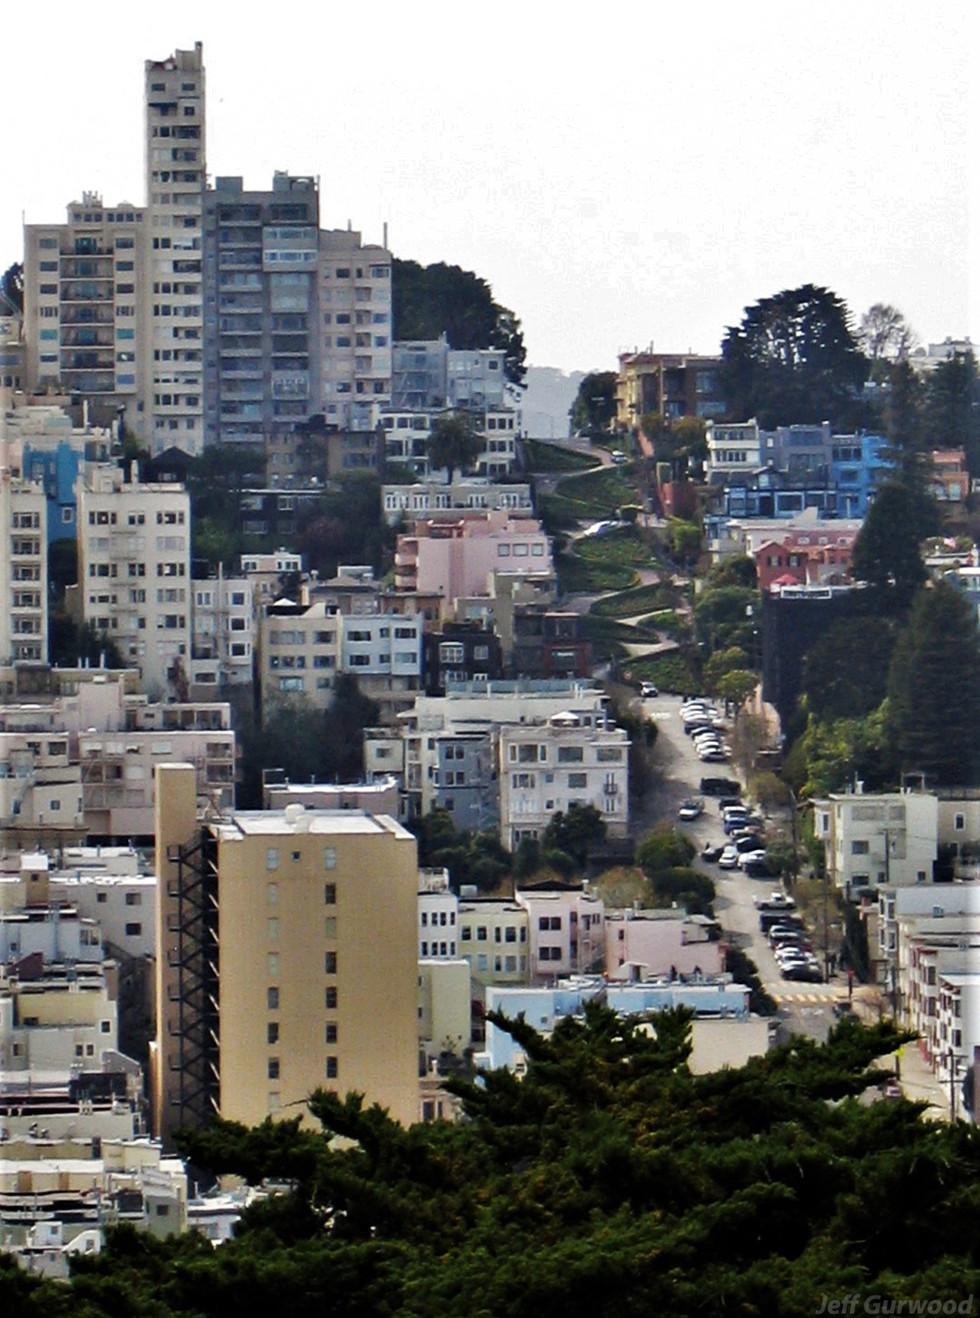 San Fransico (31) 2008